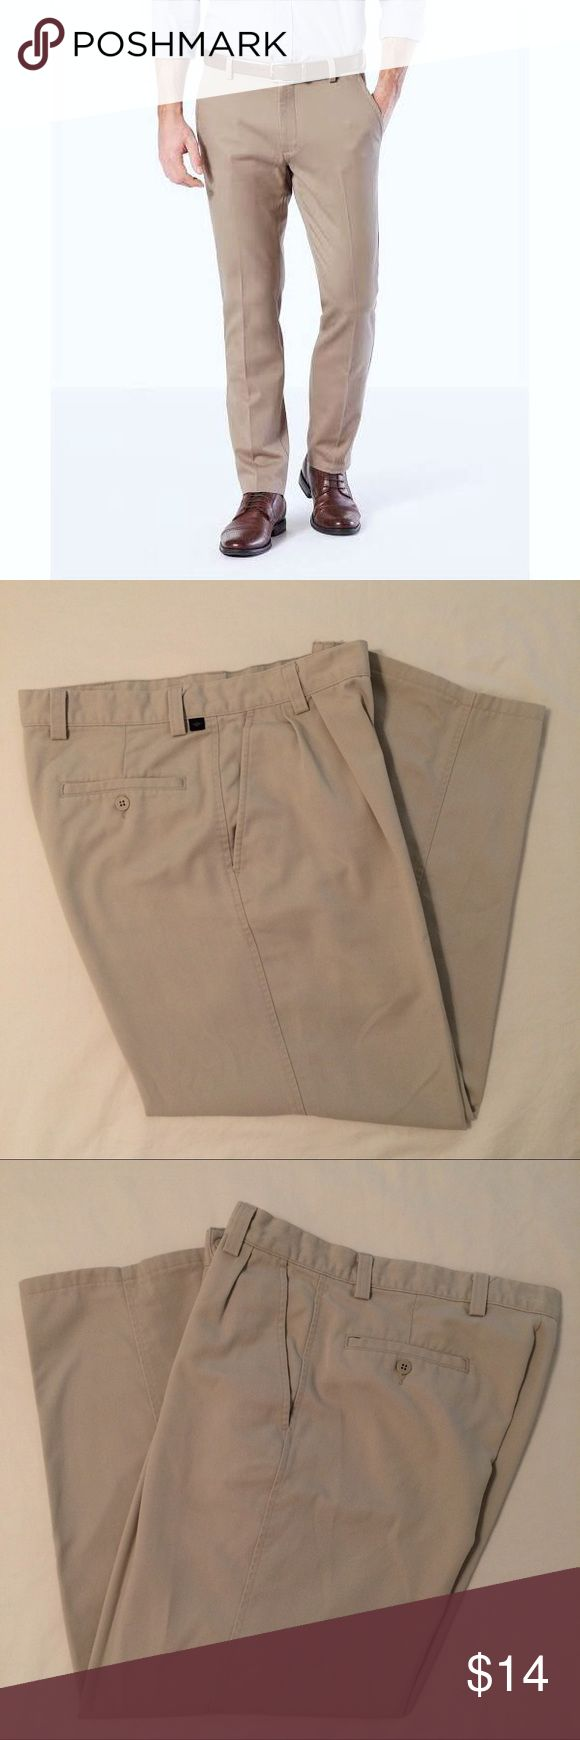 Men's Dockers Pleated Khaki Pants Men's Dockers Khaki Pants Size 33W x 28L Pleated Light Tan Color Good Condition! Dockers Pants Chinos & Khakis